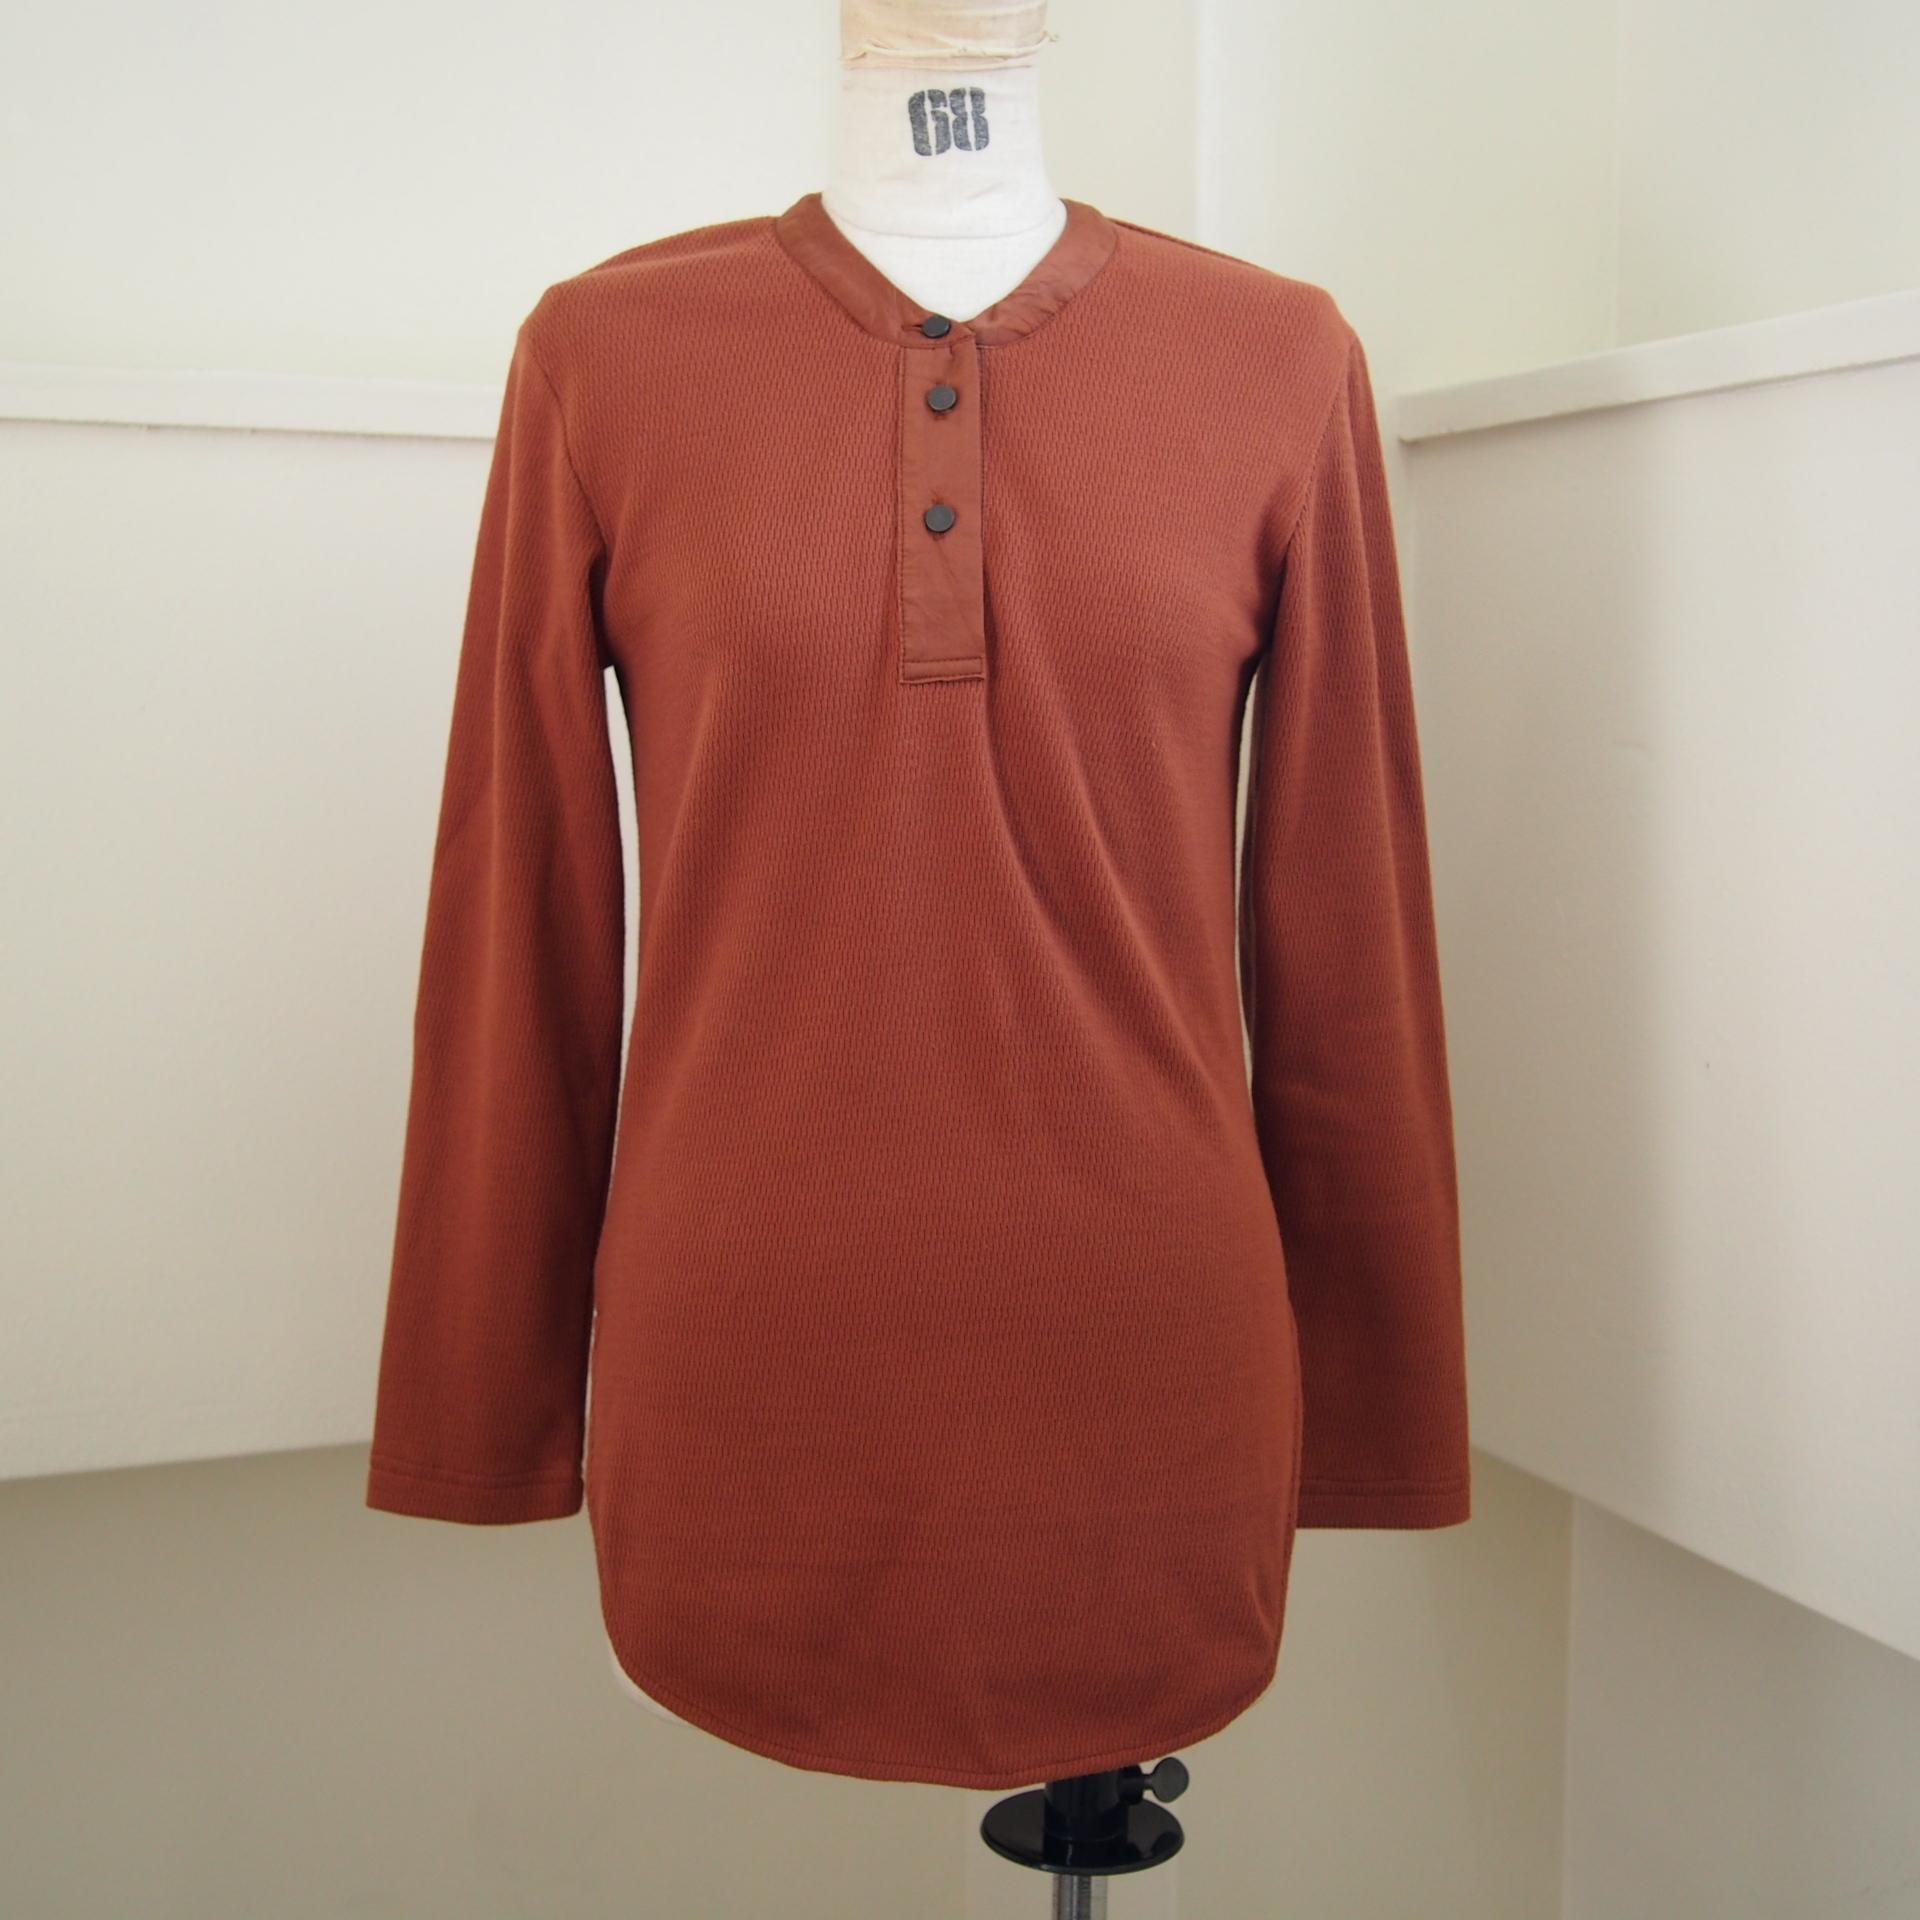 【RehersalL】military waffle henley neck(tangerine) /【リハーズオール】ミリタリーワッフルヘンリーネック(タンジェリン)